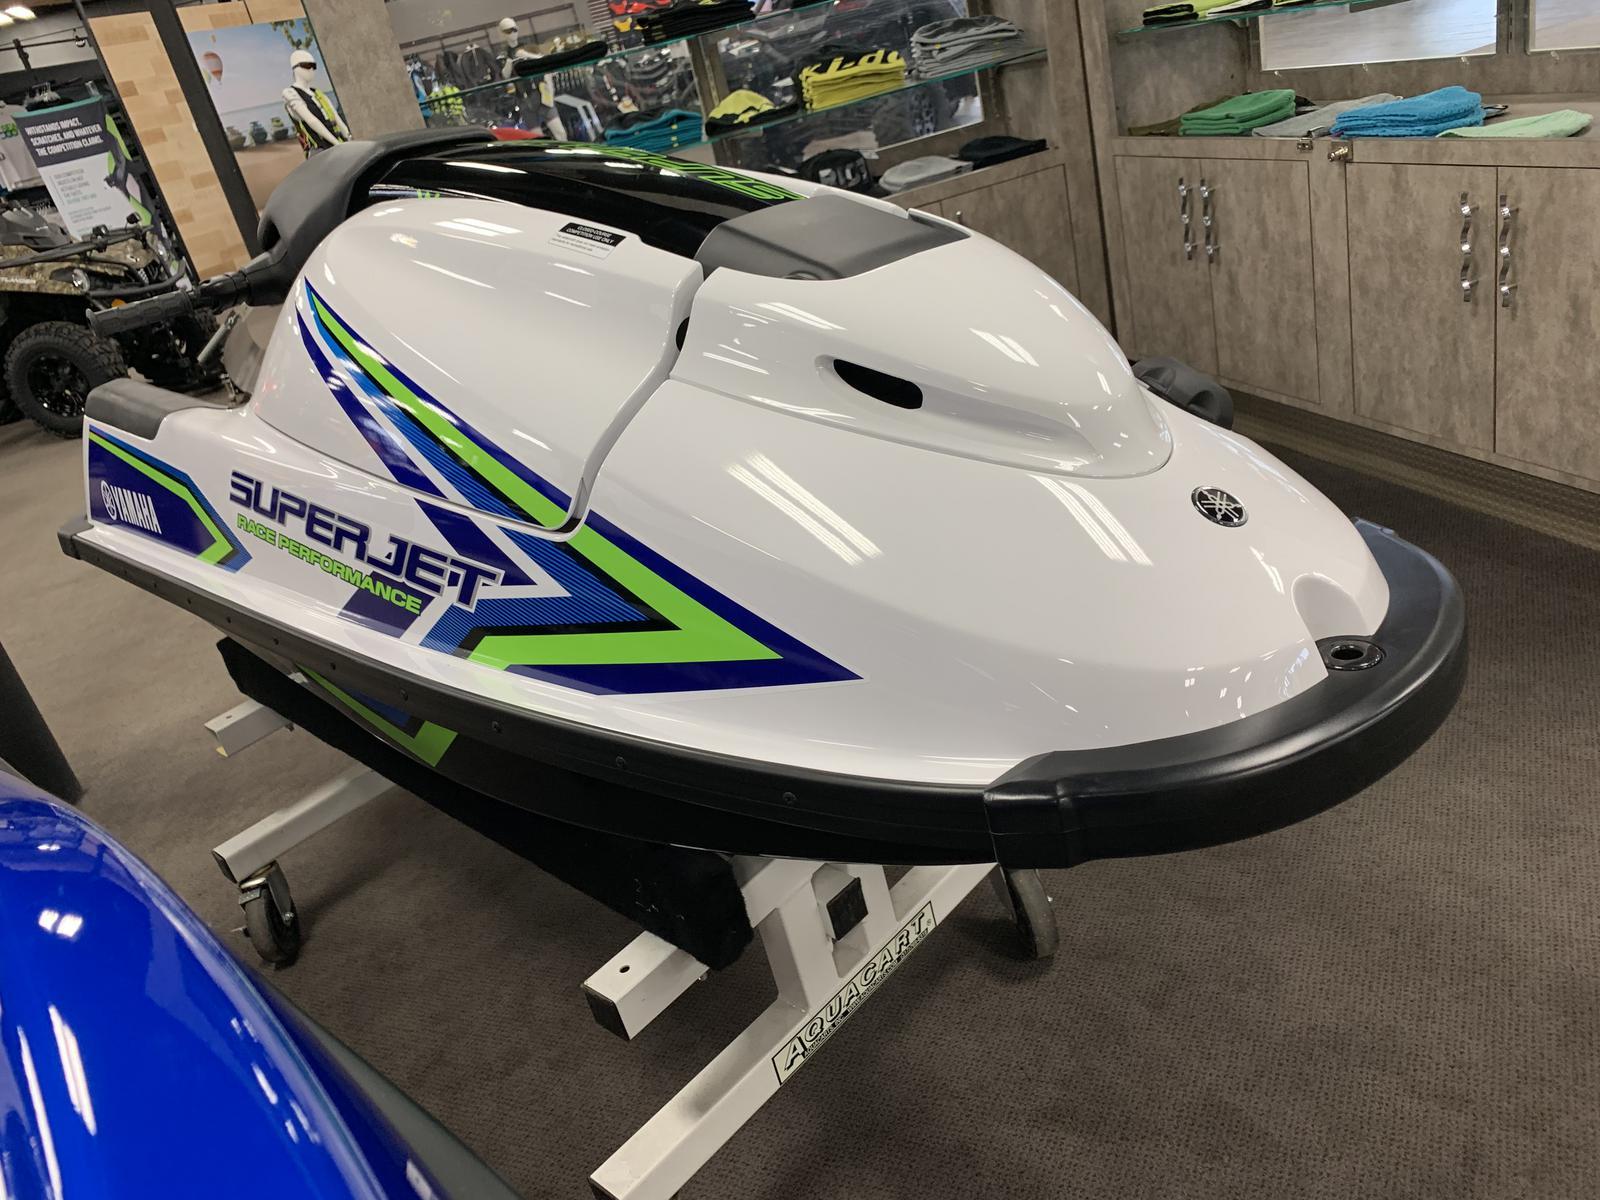 2019 Yamaha SUPERJET